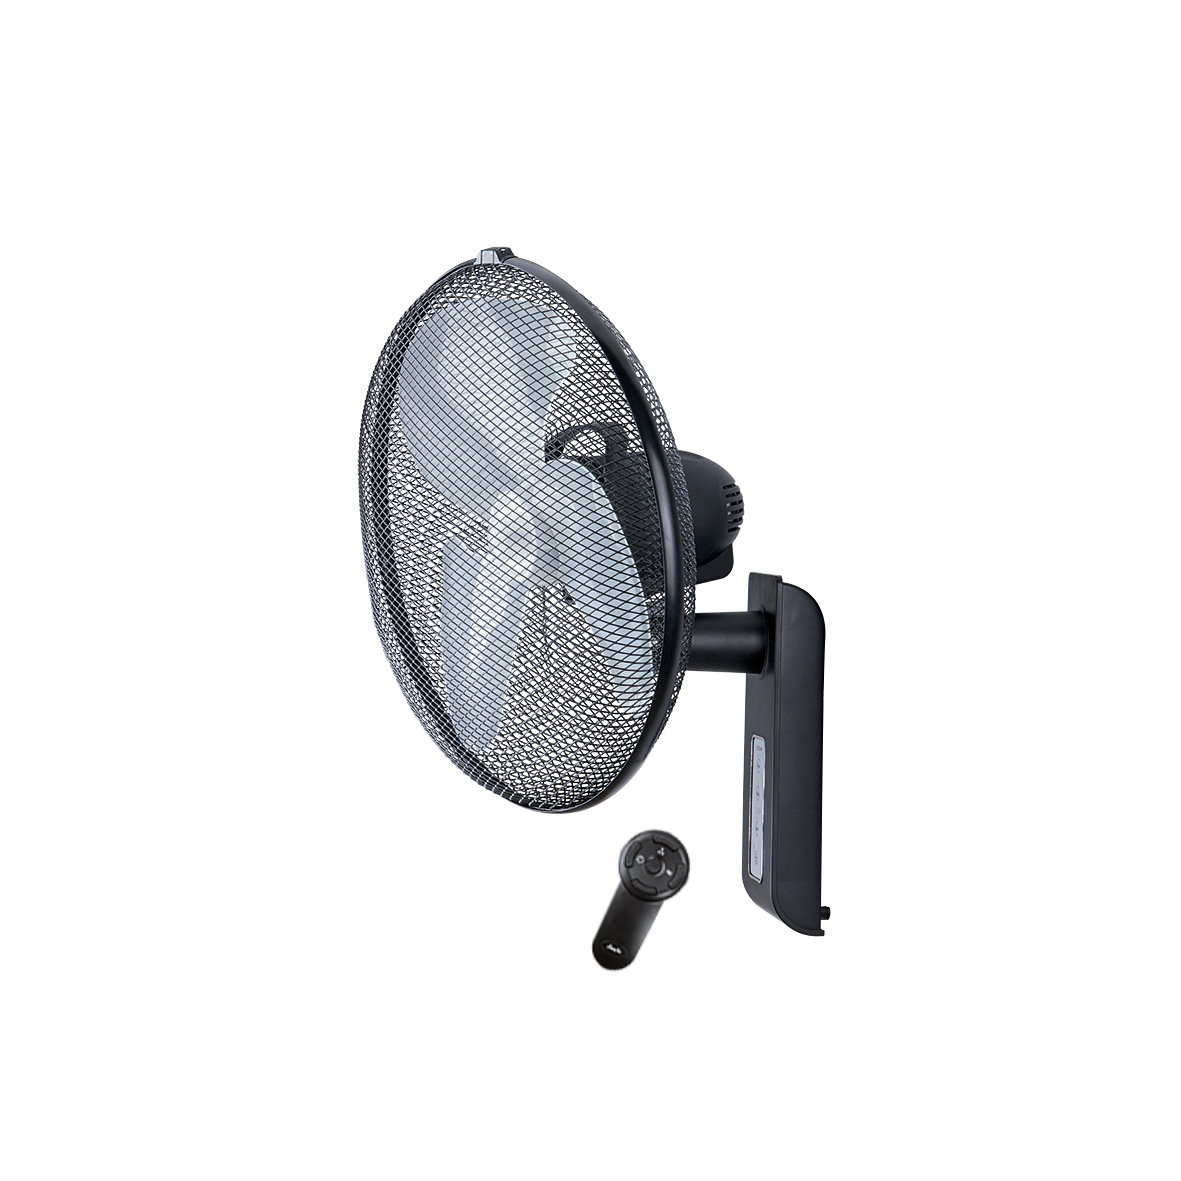 design ventilator wandventilator wand windmaschine gewerbe industrie profi ebay. Black Bedroom Furniture Sets. Home Design Ideas